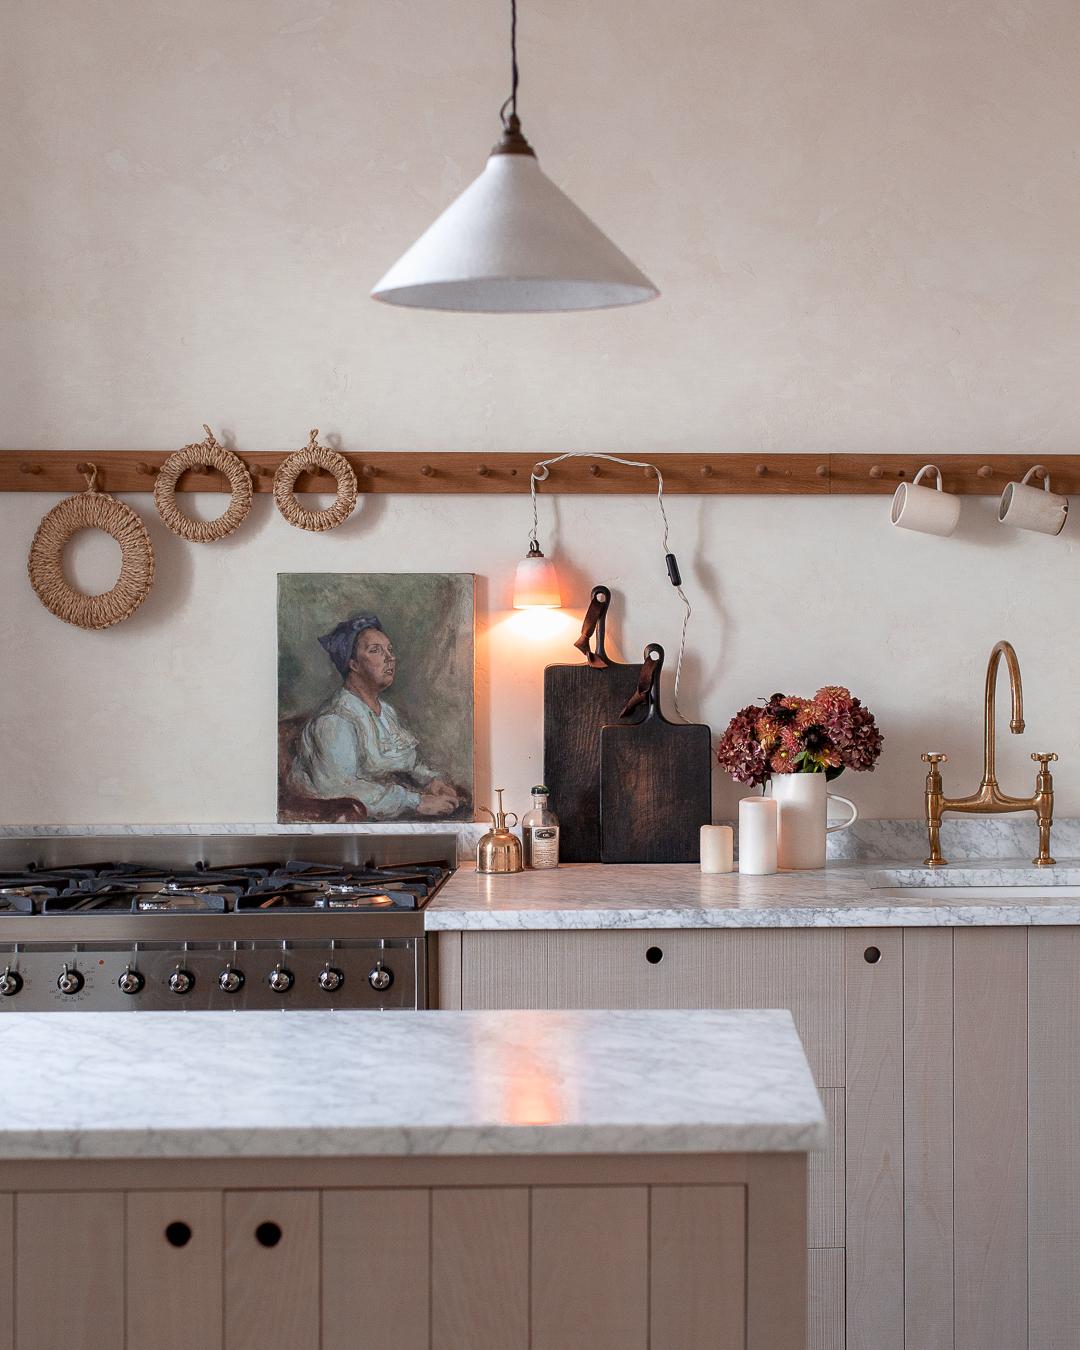 The Ingredients LDN Kitchen by deVOL